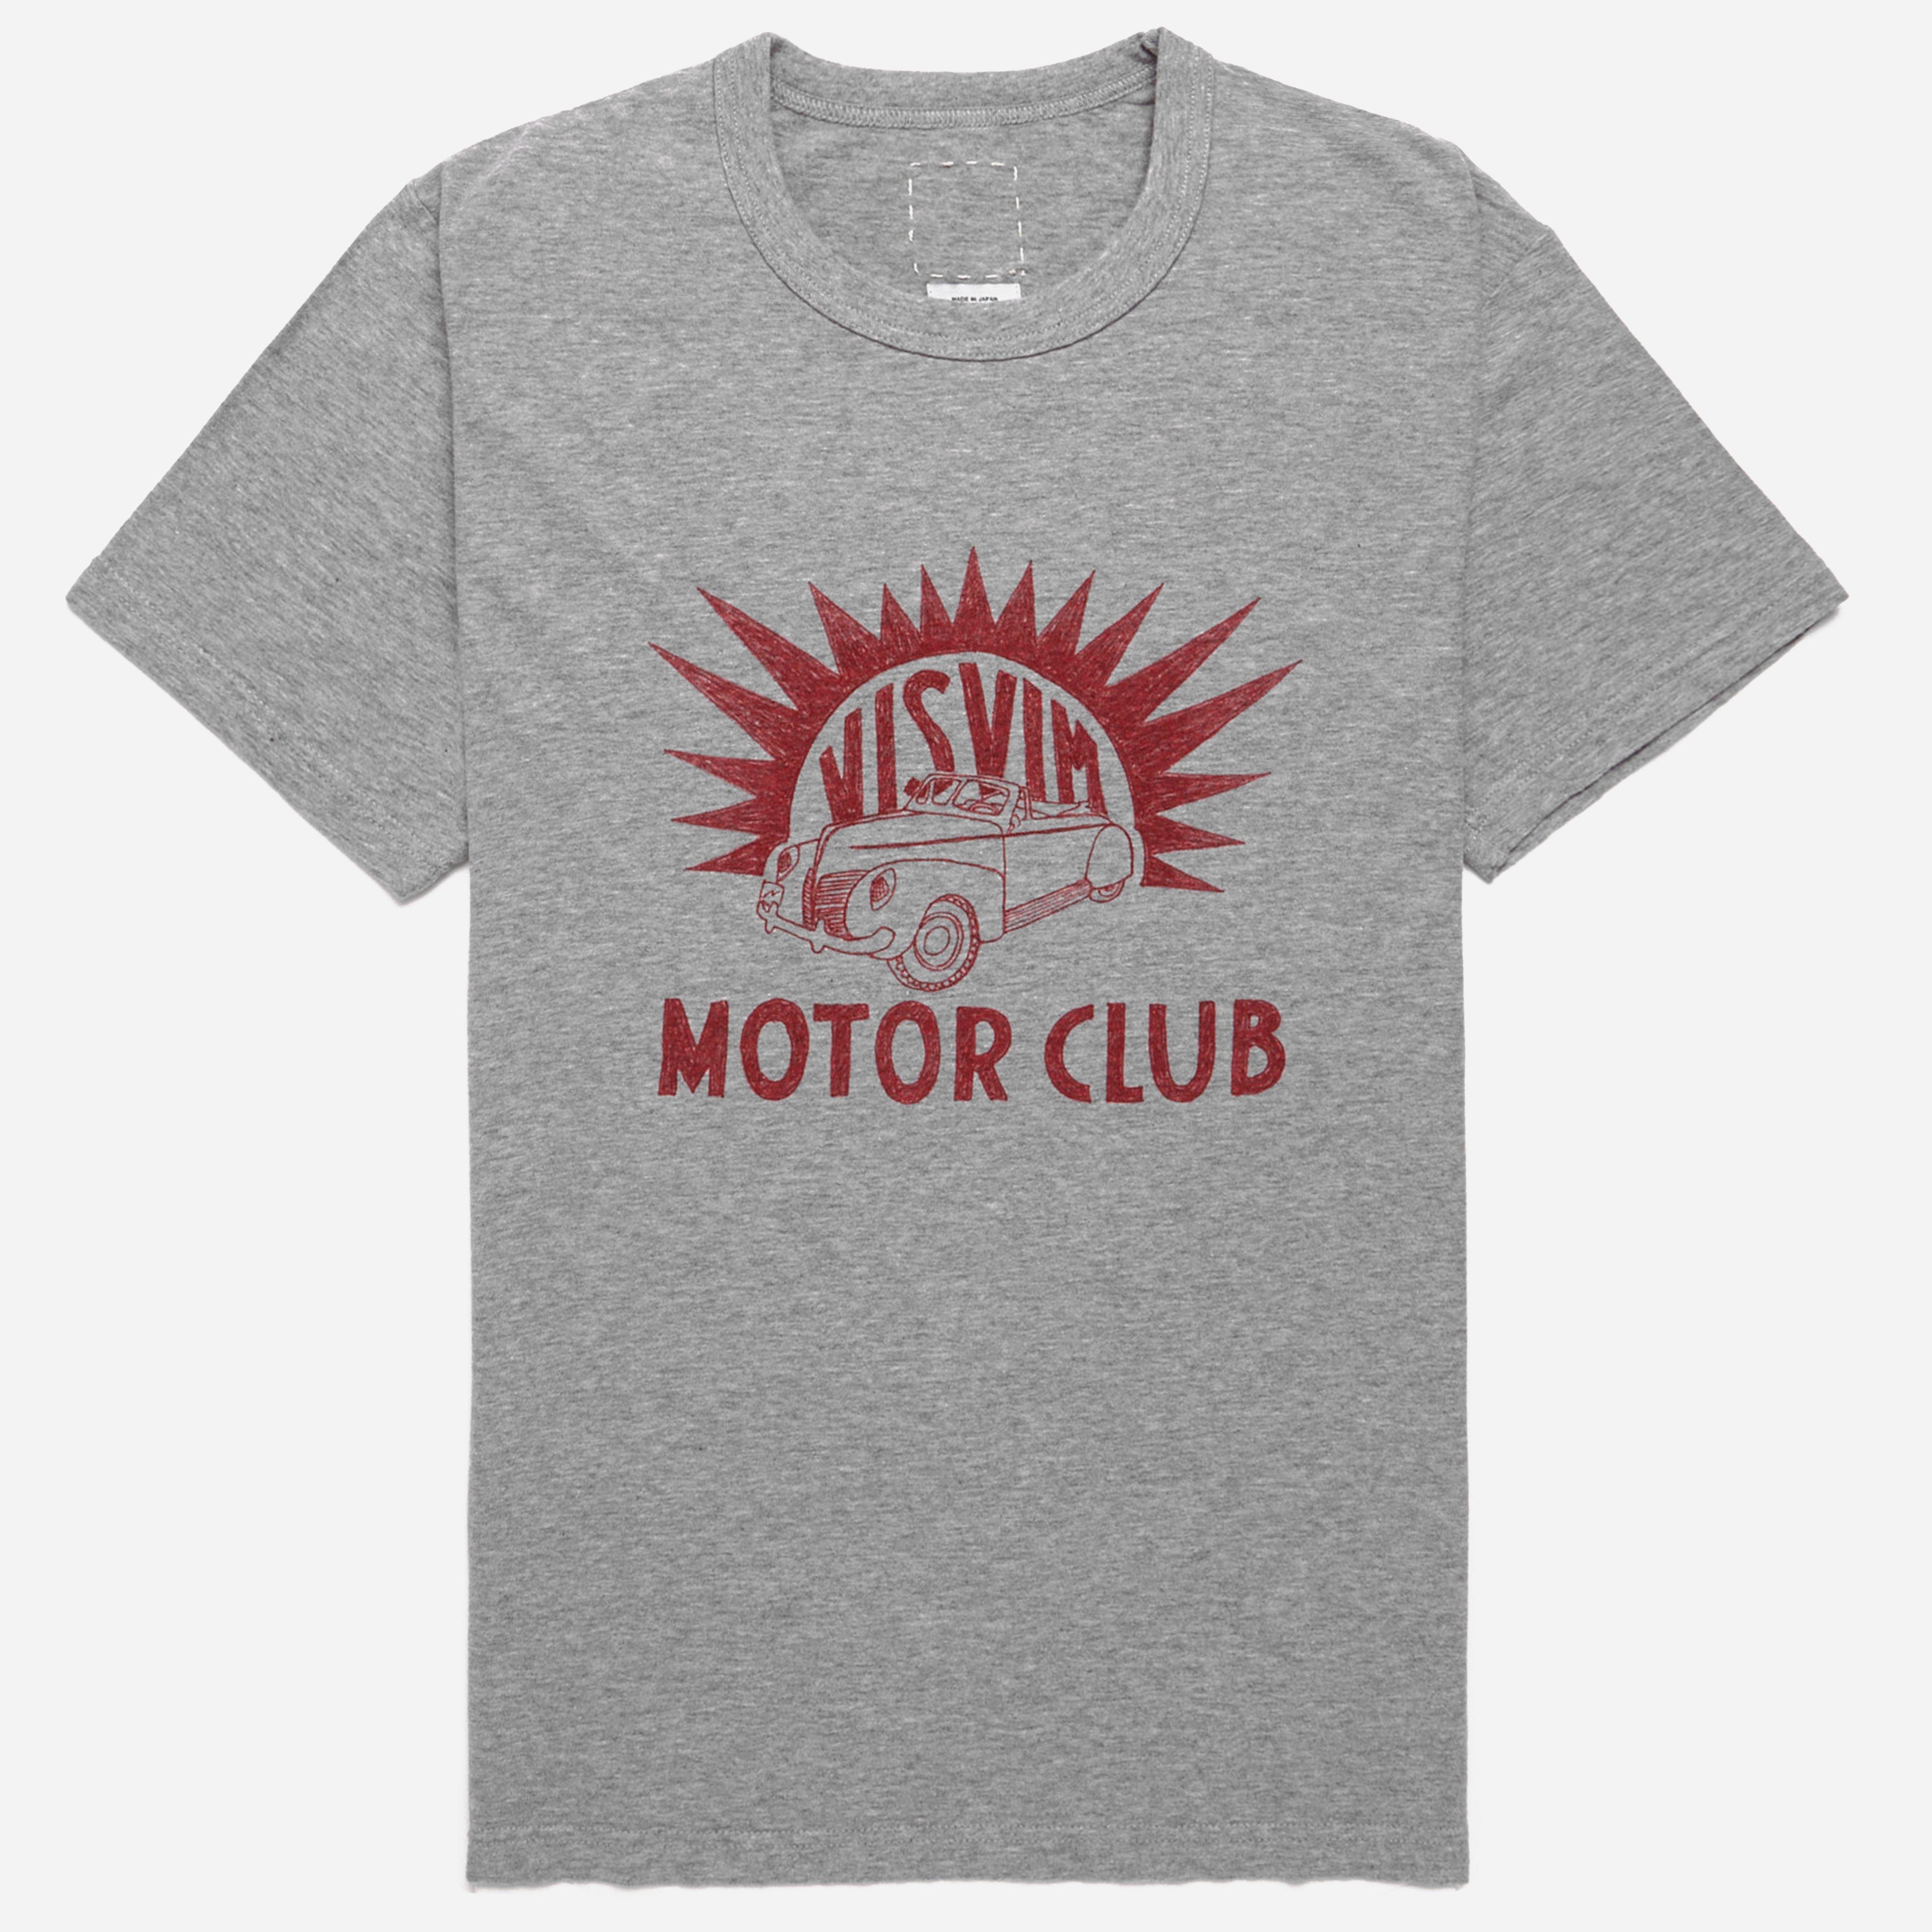 Visvim Motor Cycle Club T-shirt